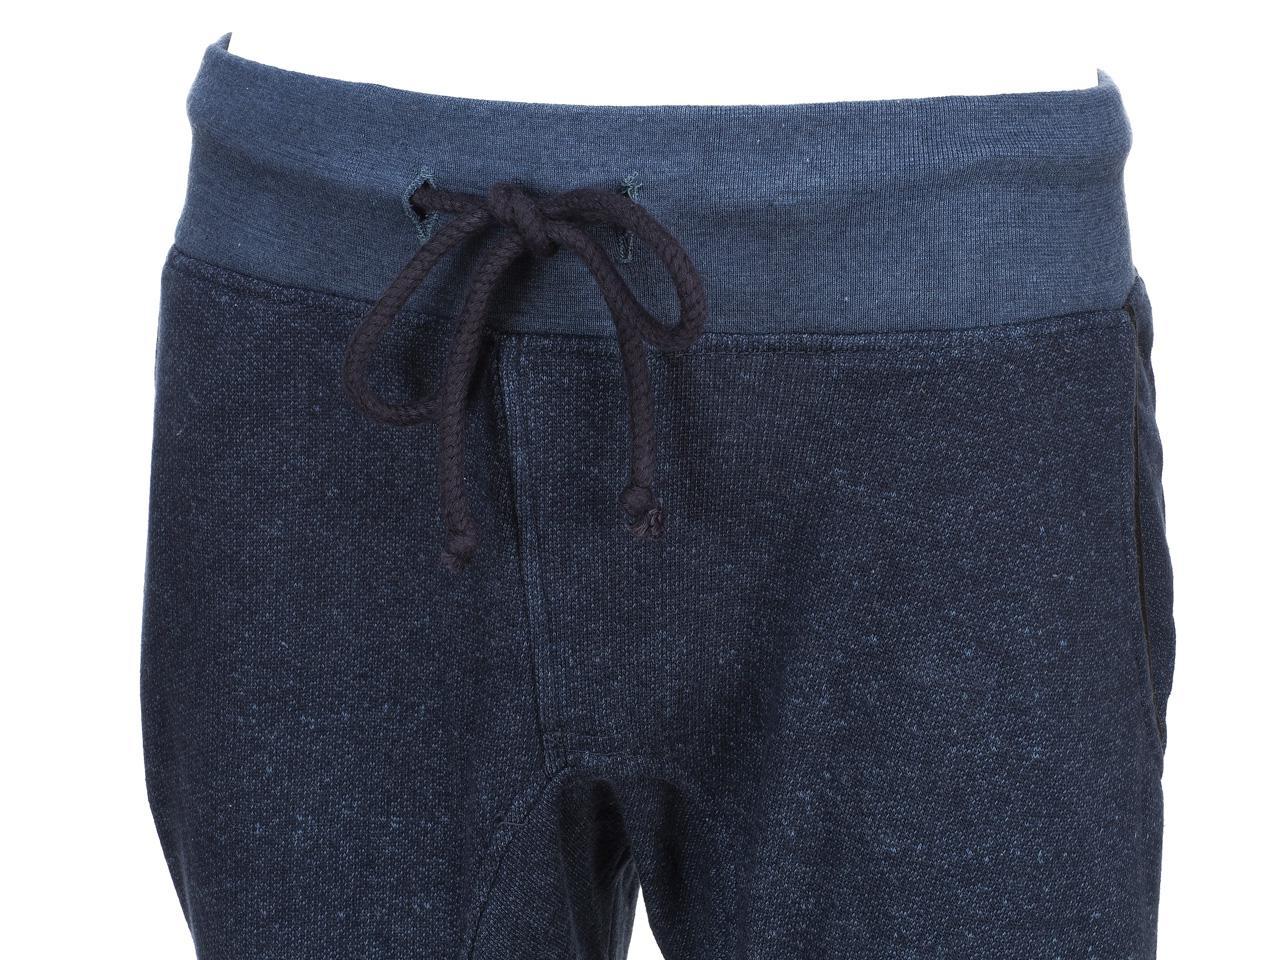 Pantalon-de-survetement-Biaggio-Krodil-navy-pant-jogg-Bleu-57532-Neuf miniature 3